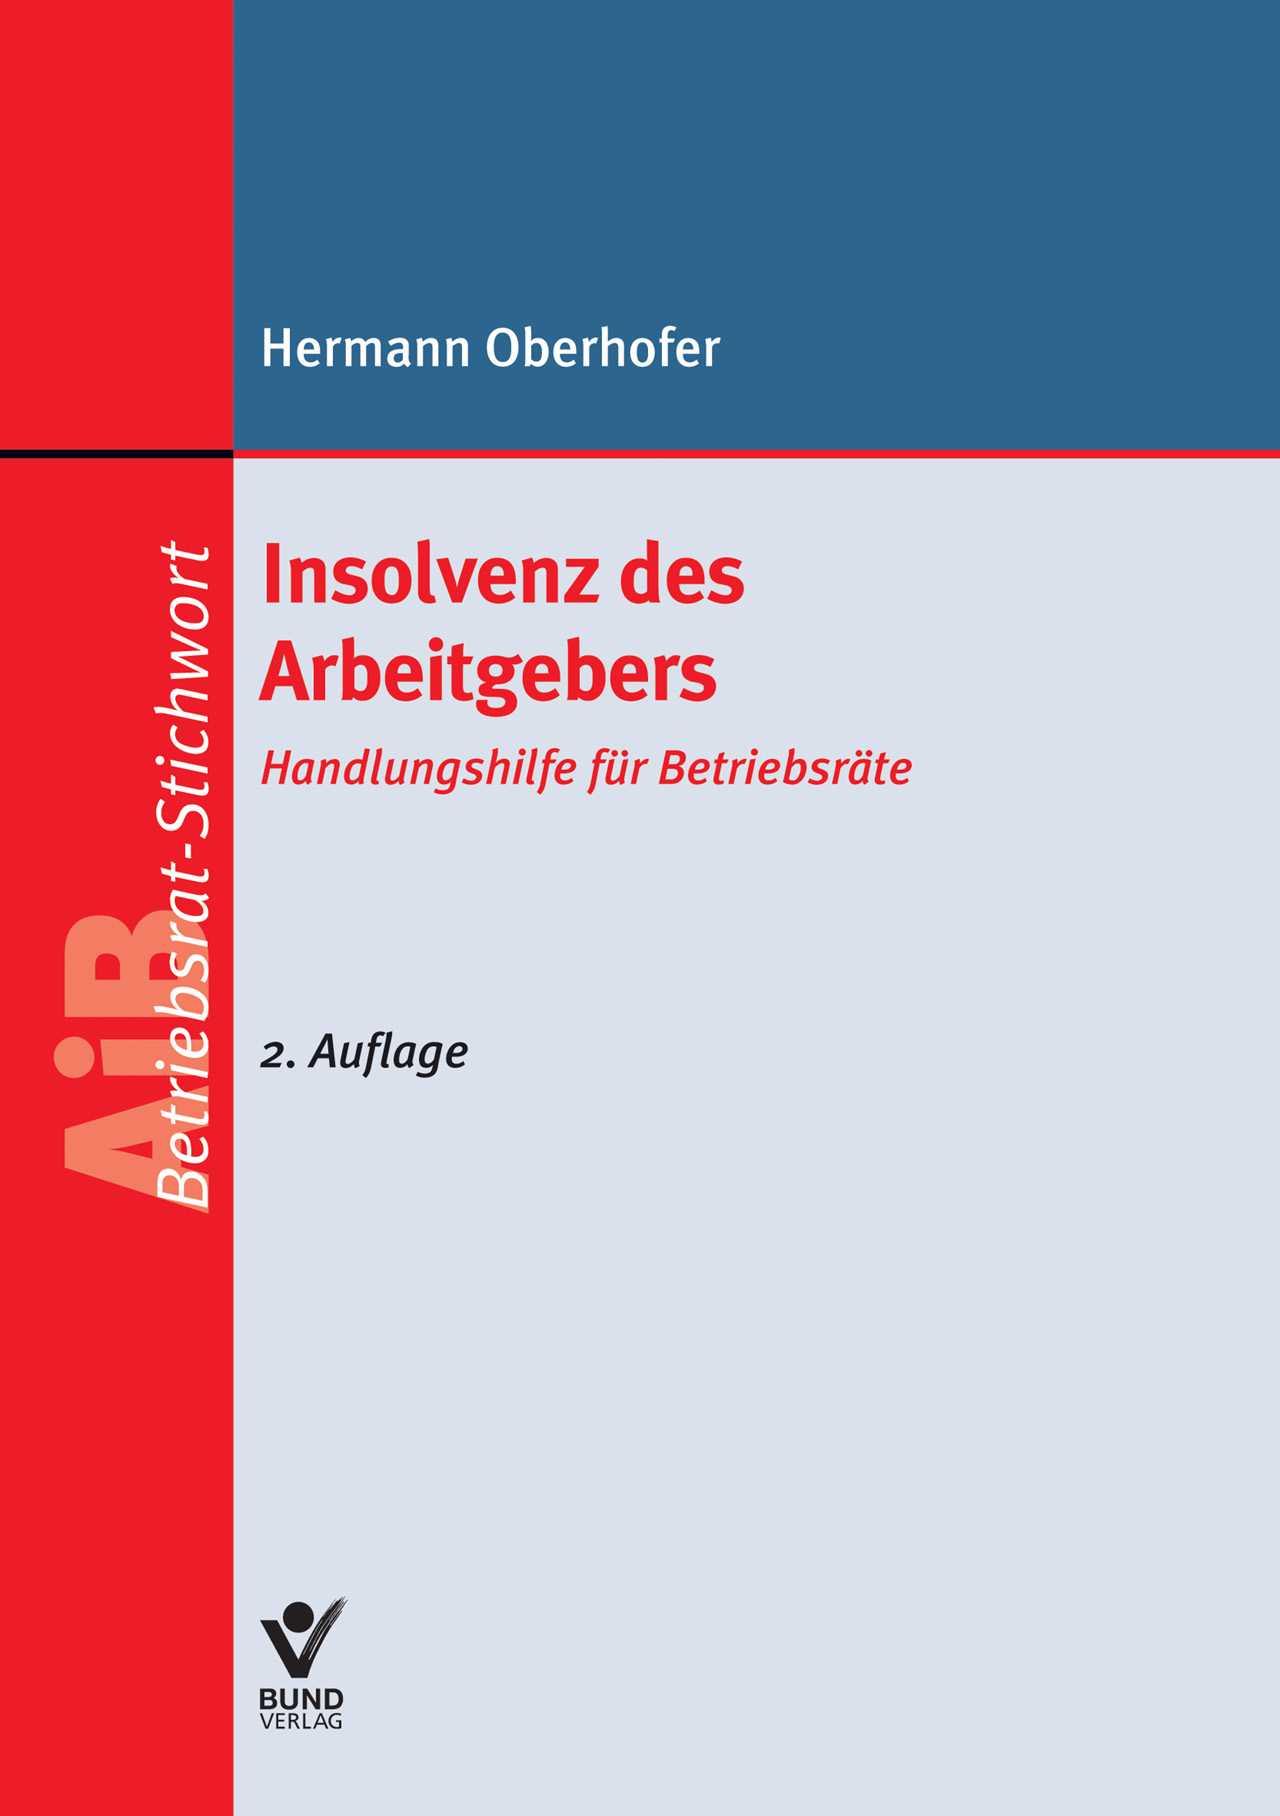 Insolvenz des Arbeitgebers Hermann Oberhofer